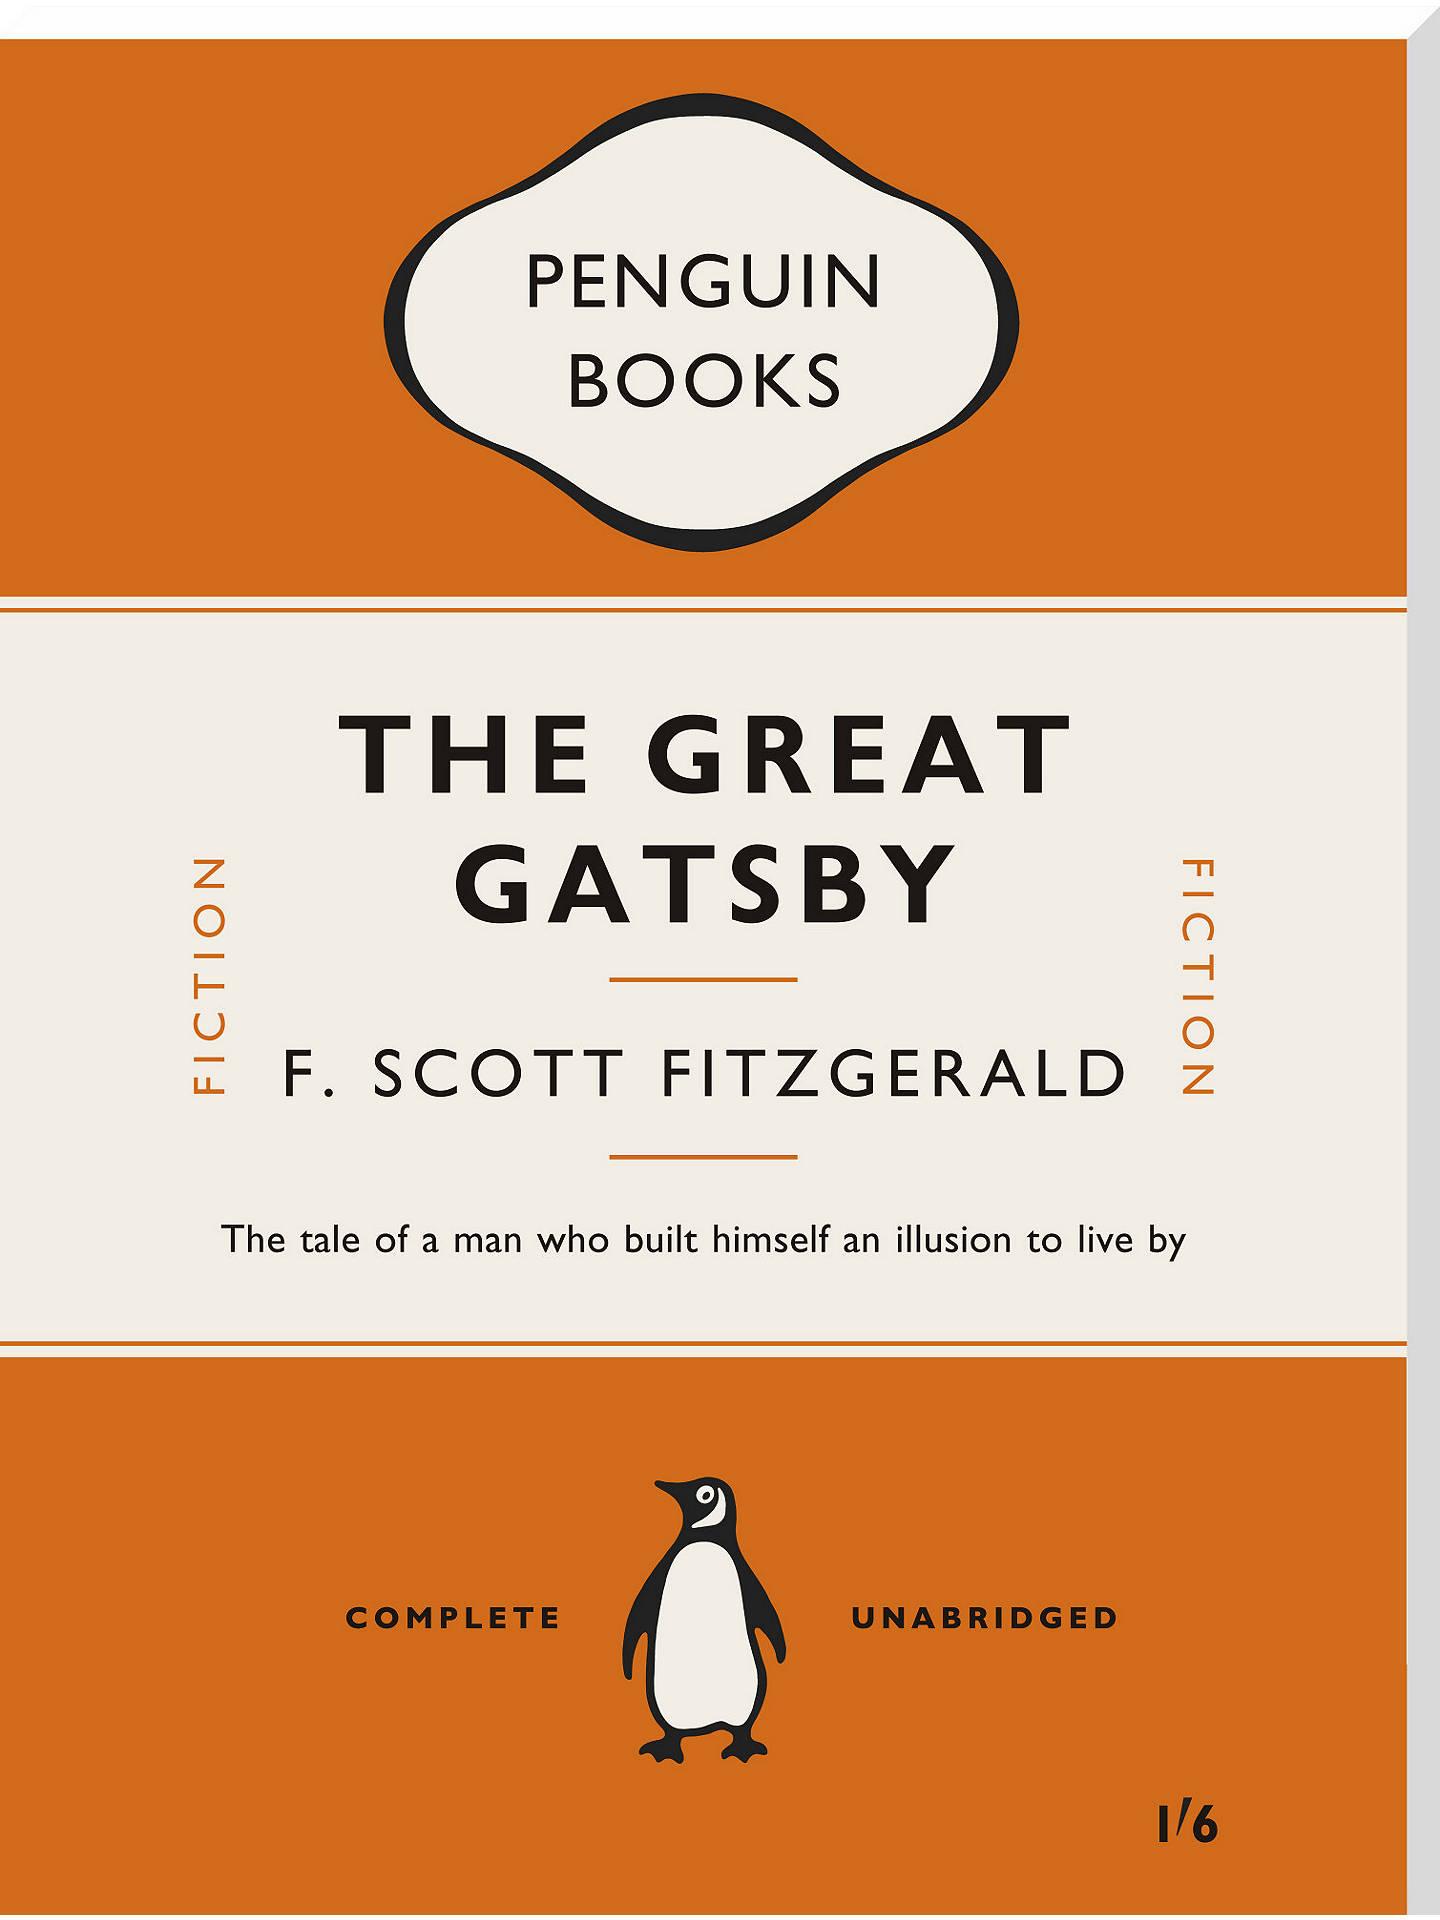 Penguin Books - F Scott Fitzgerald The Great Gatsby at John Lewis & Partners